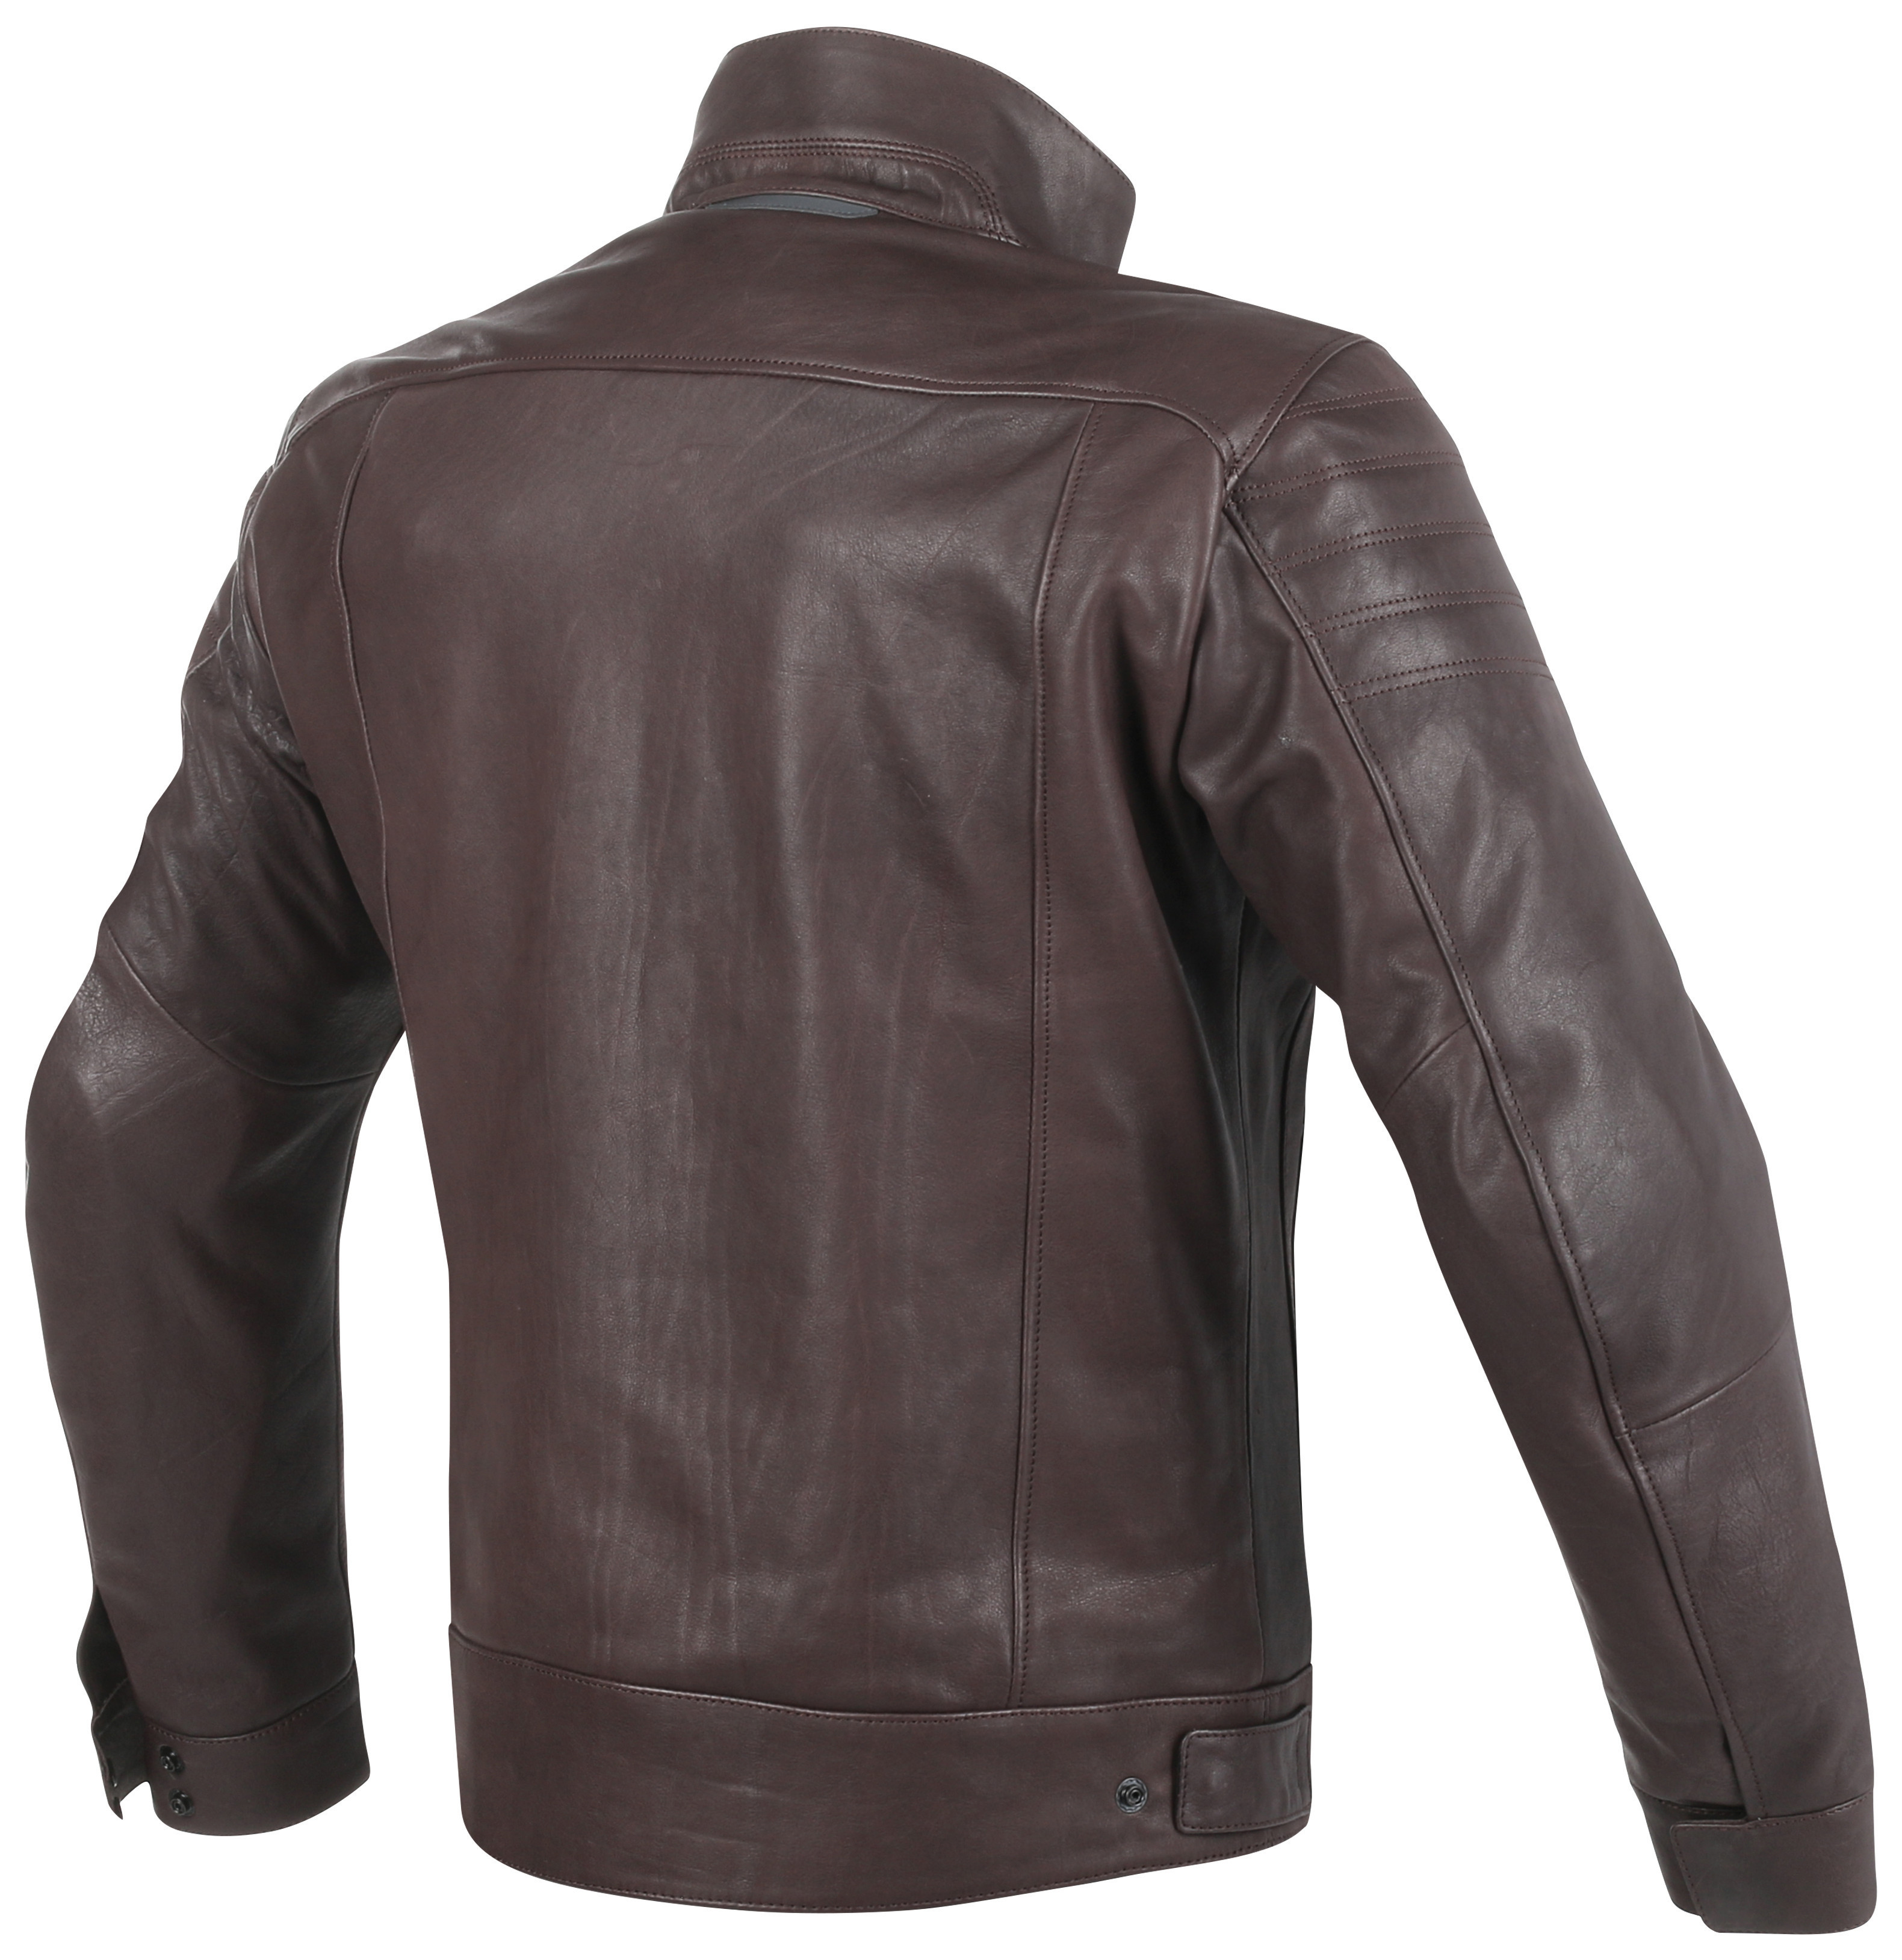 debfa25bdd8 Dainese Bryan Leather Jacket - RevZilla